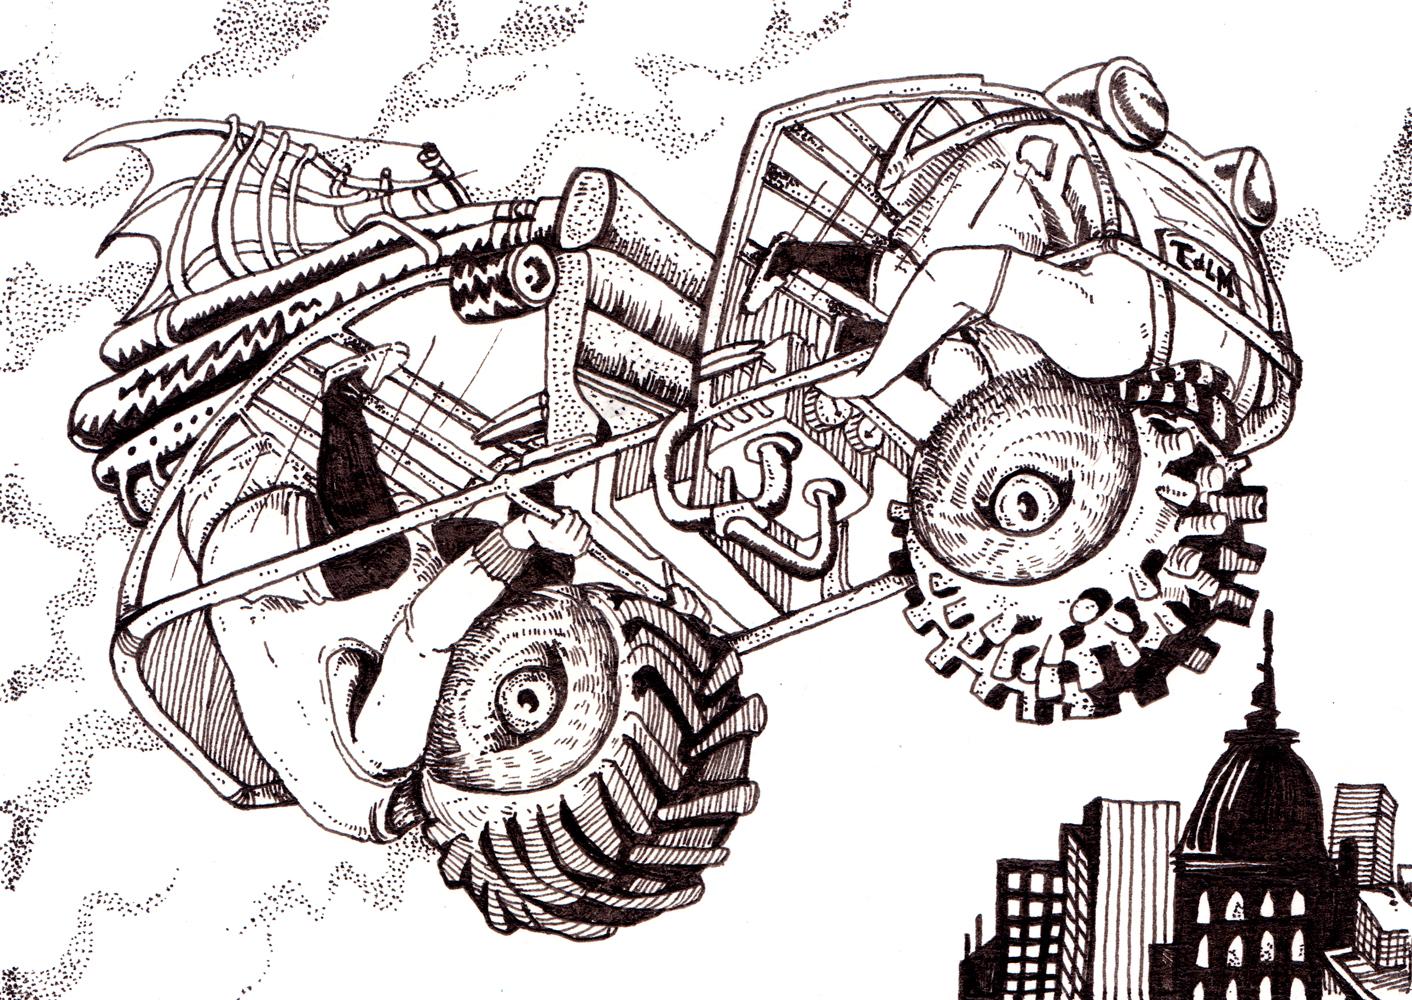 Twinmobile